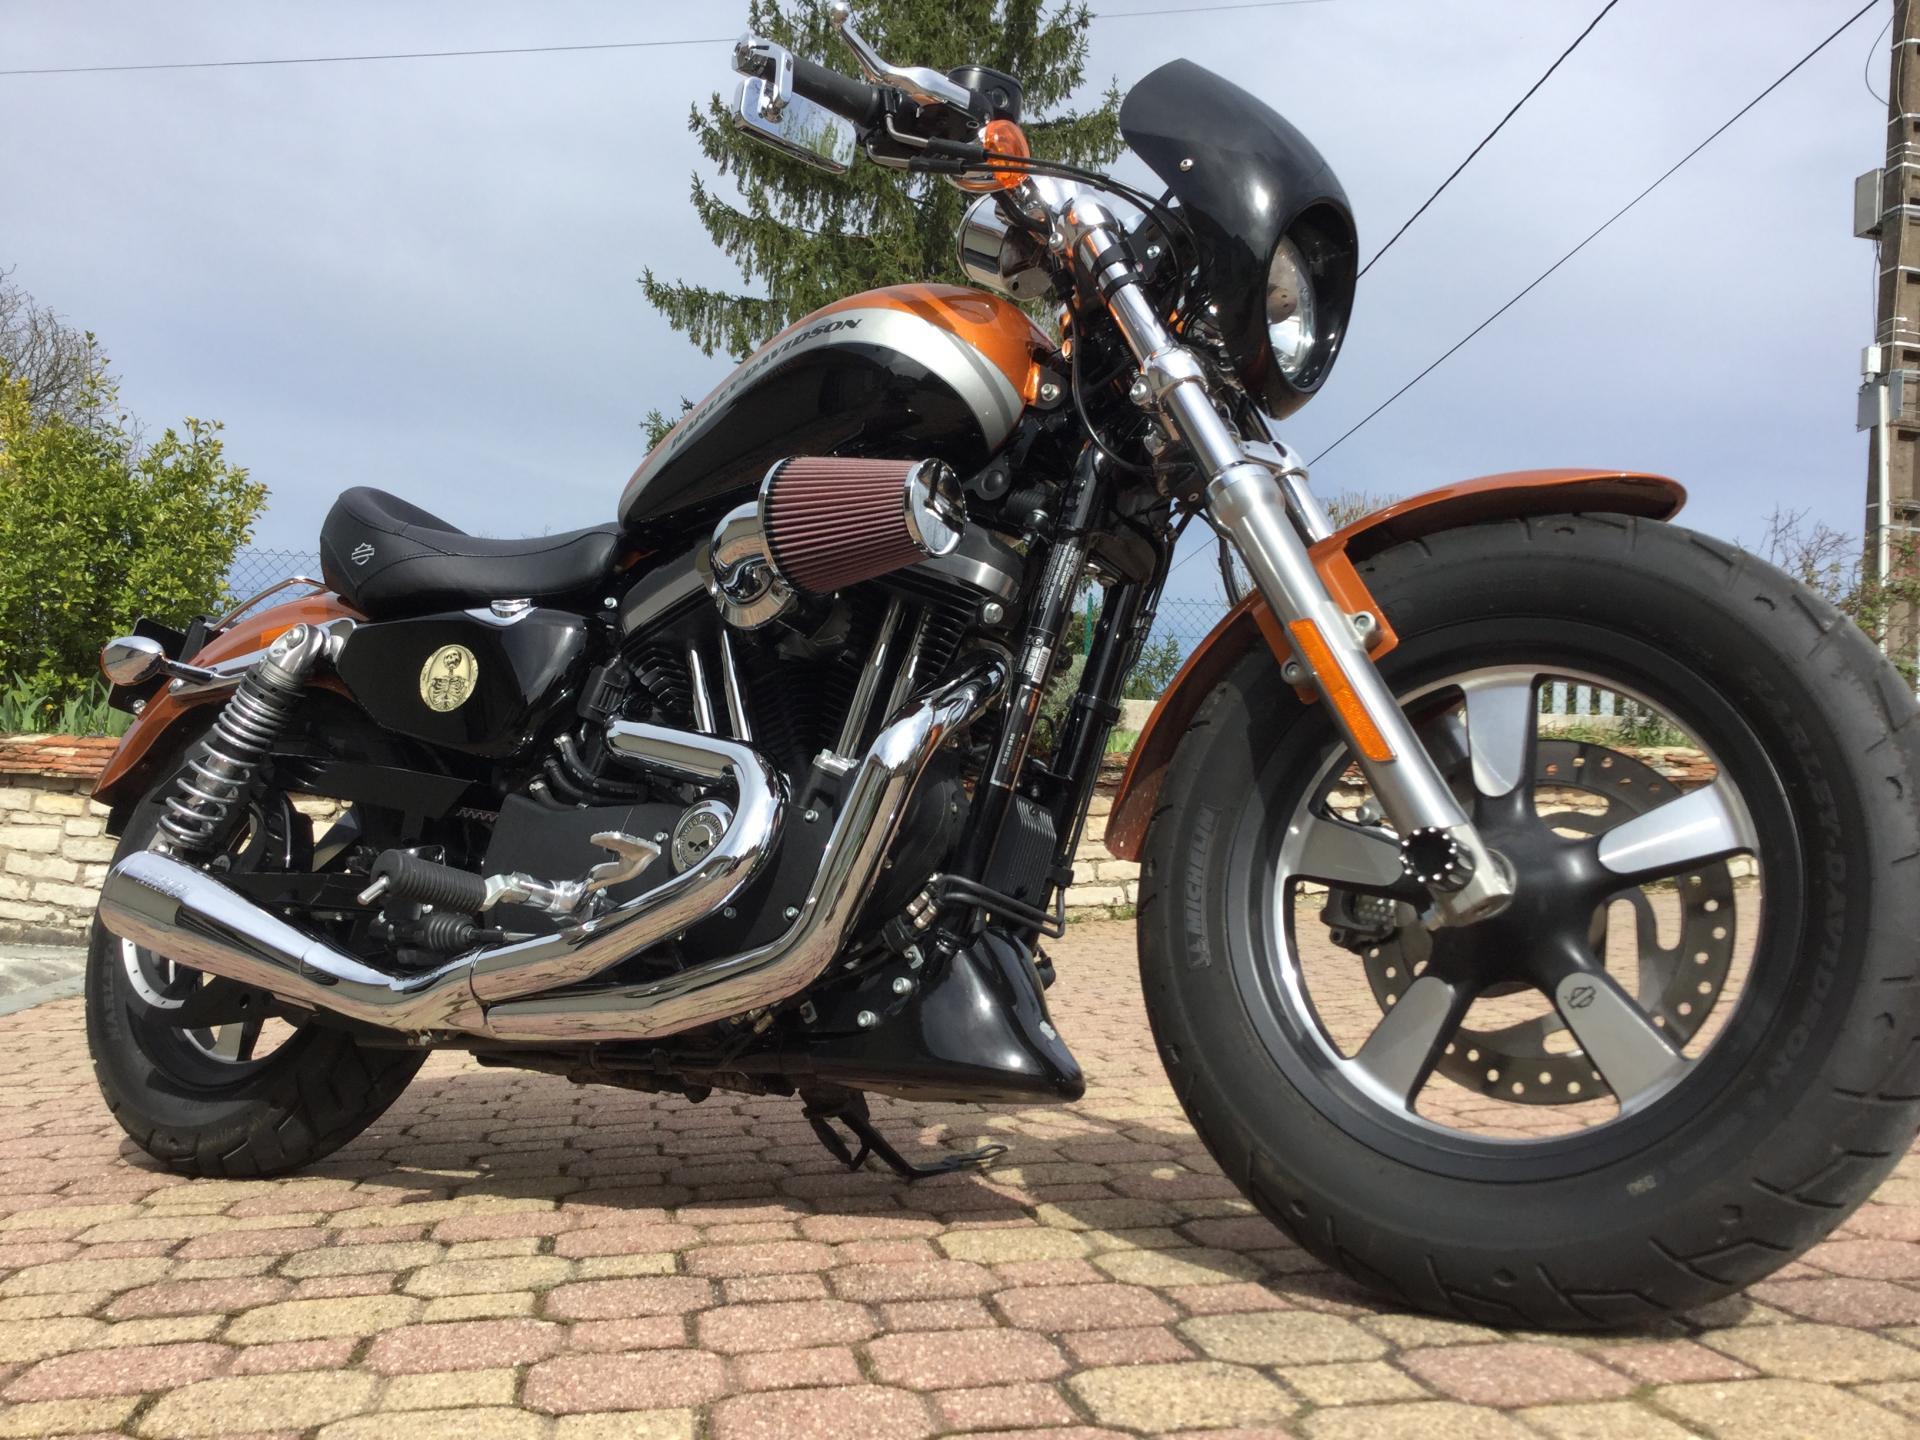 Harley sportster XL1200 CA